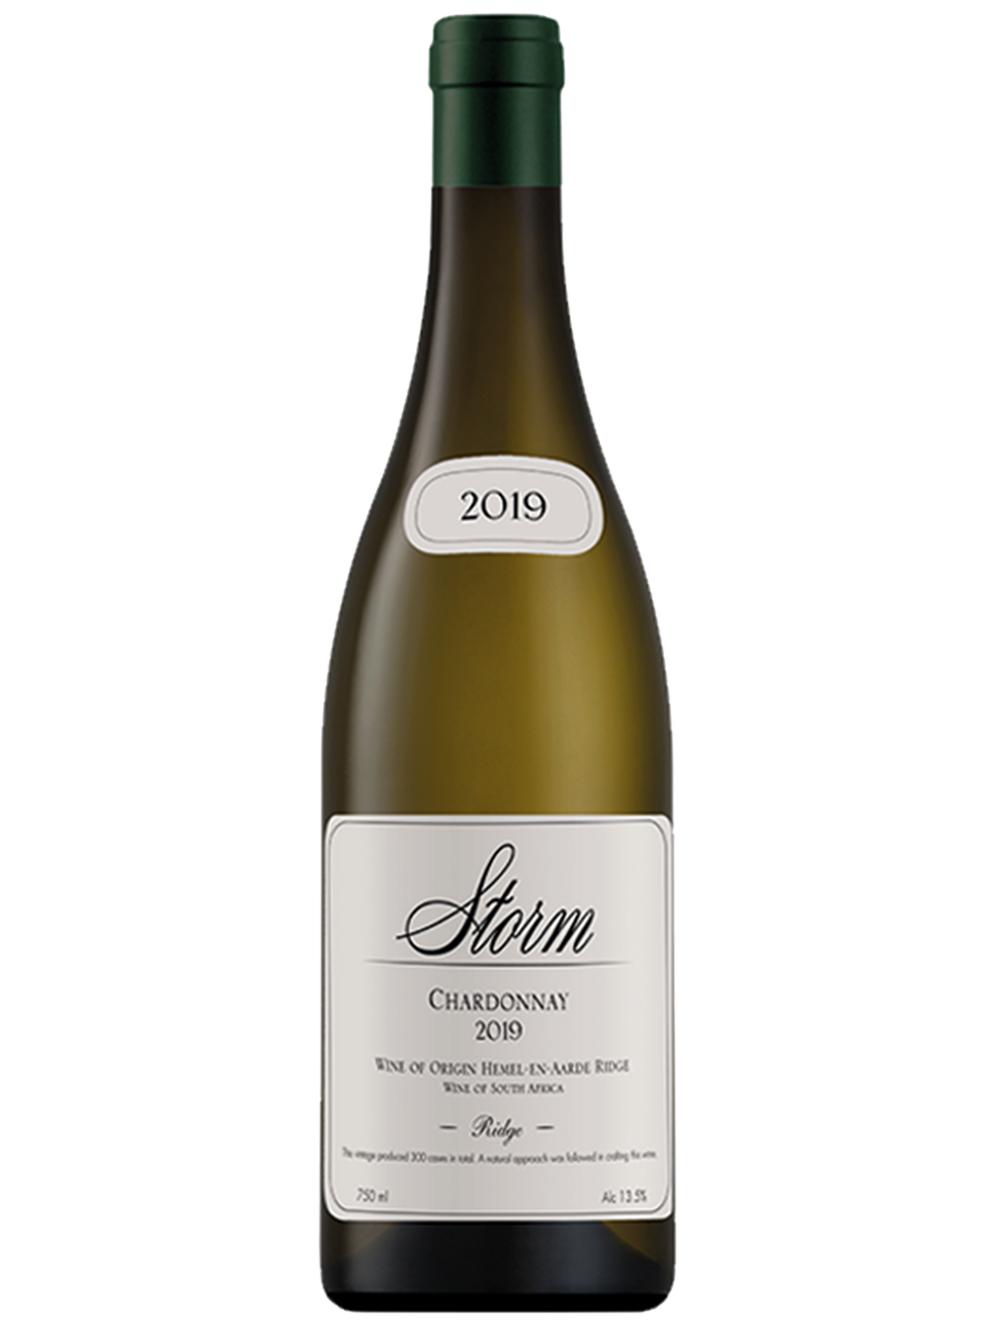 2019 Ridge Chardonnay